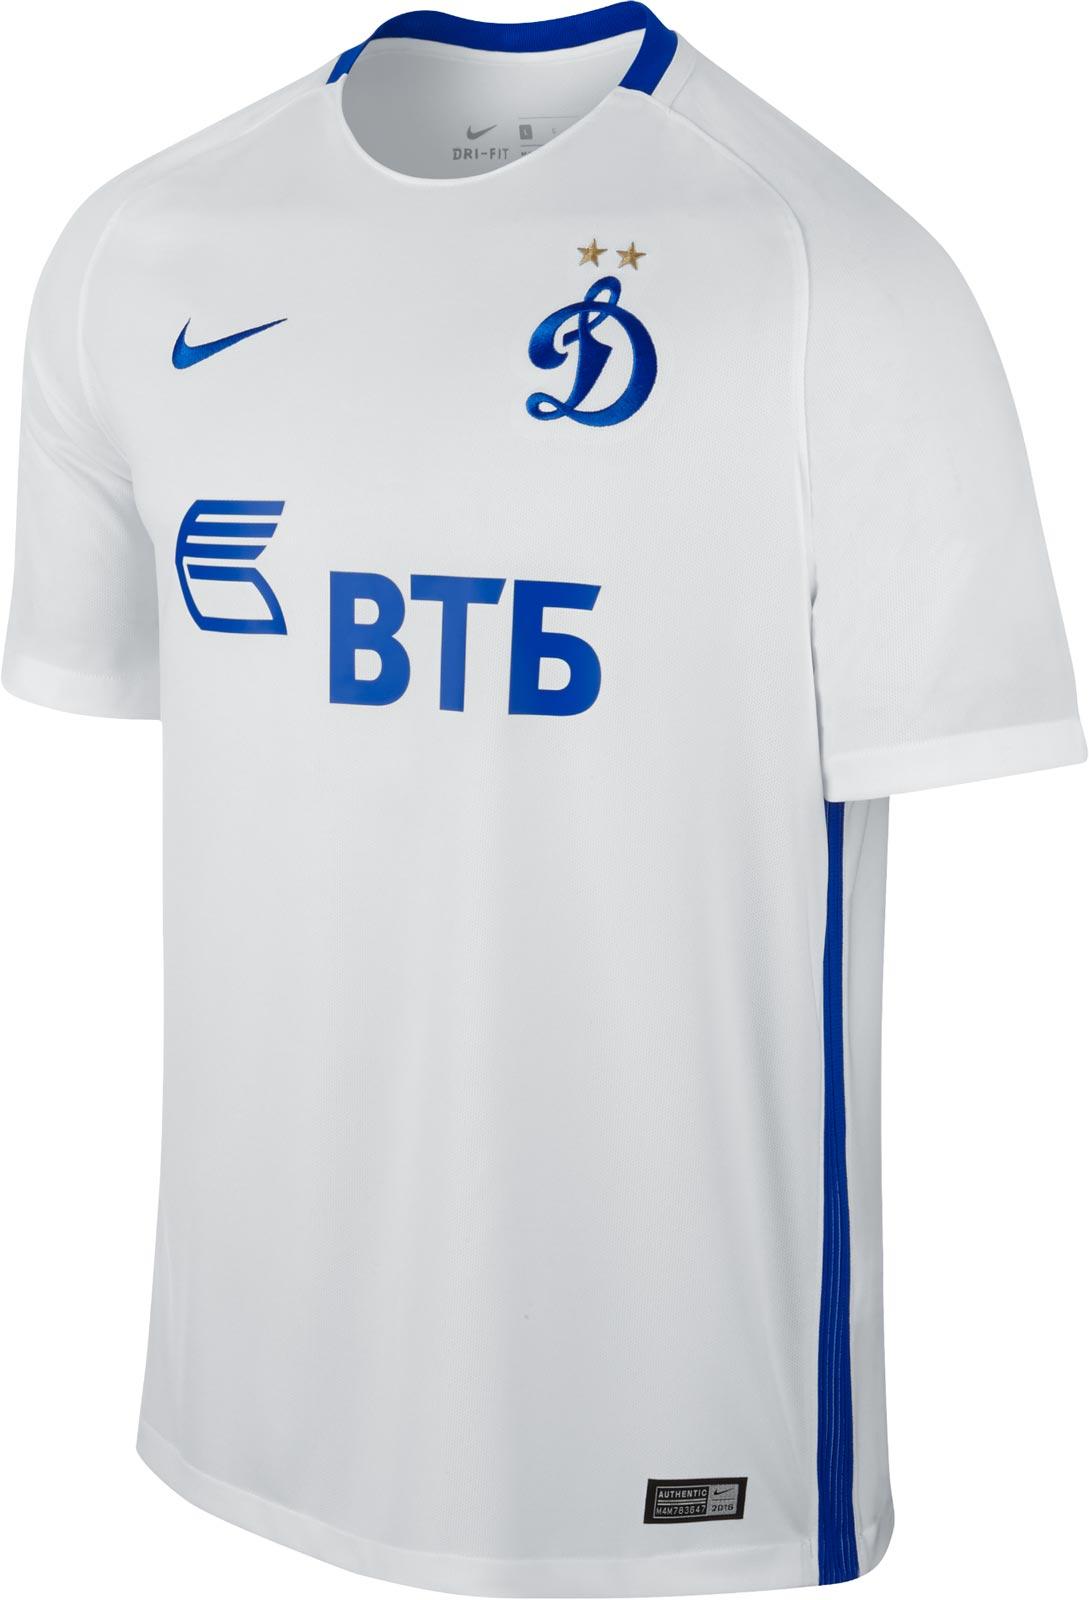 Dynamo Moscow 16 17 Kits Released Footy Headlines